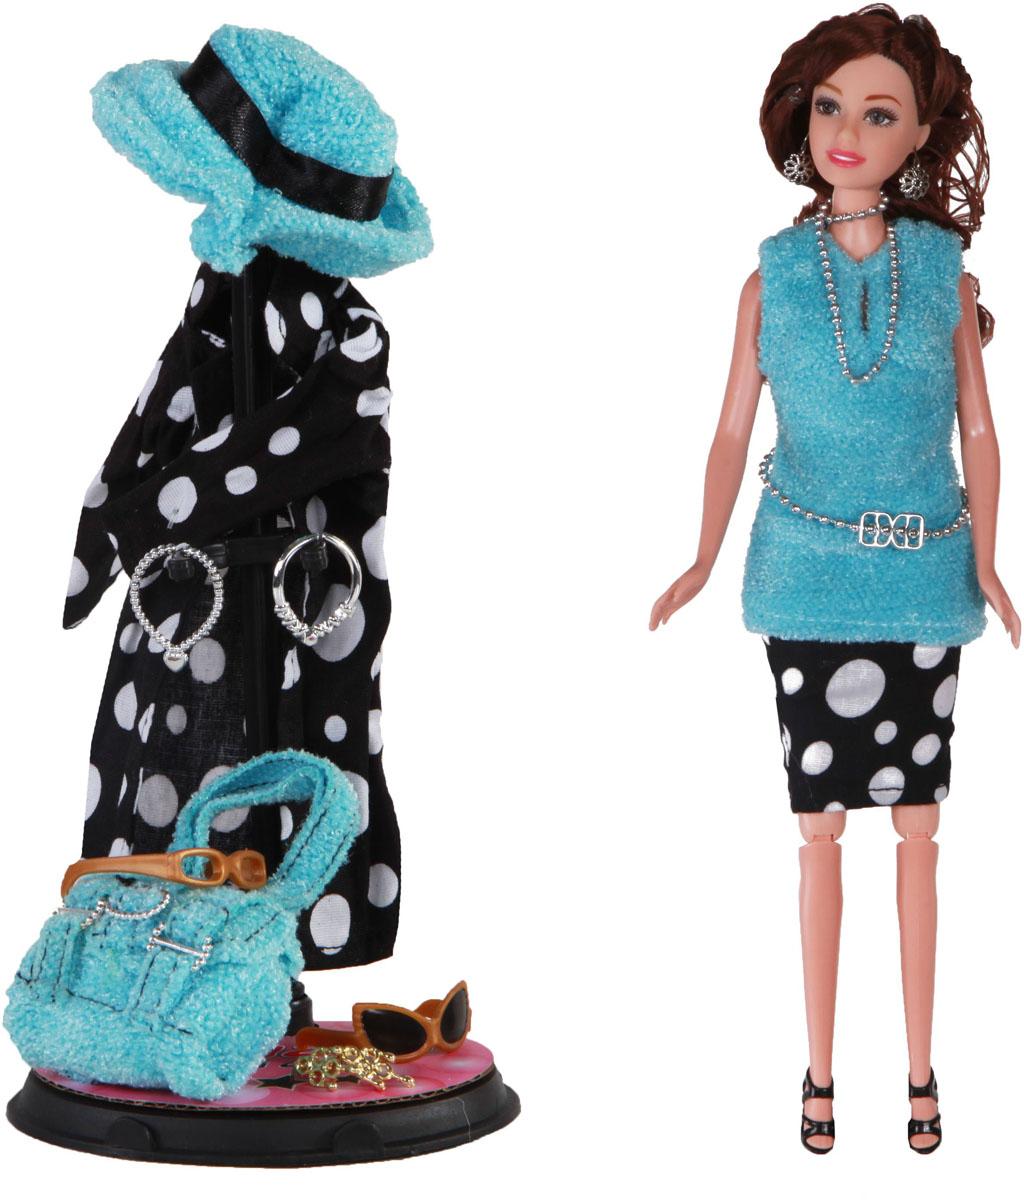 Yako Кукла Натали M6581-3 куклы и одежда для кукол yako кукла софи m6579 4